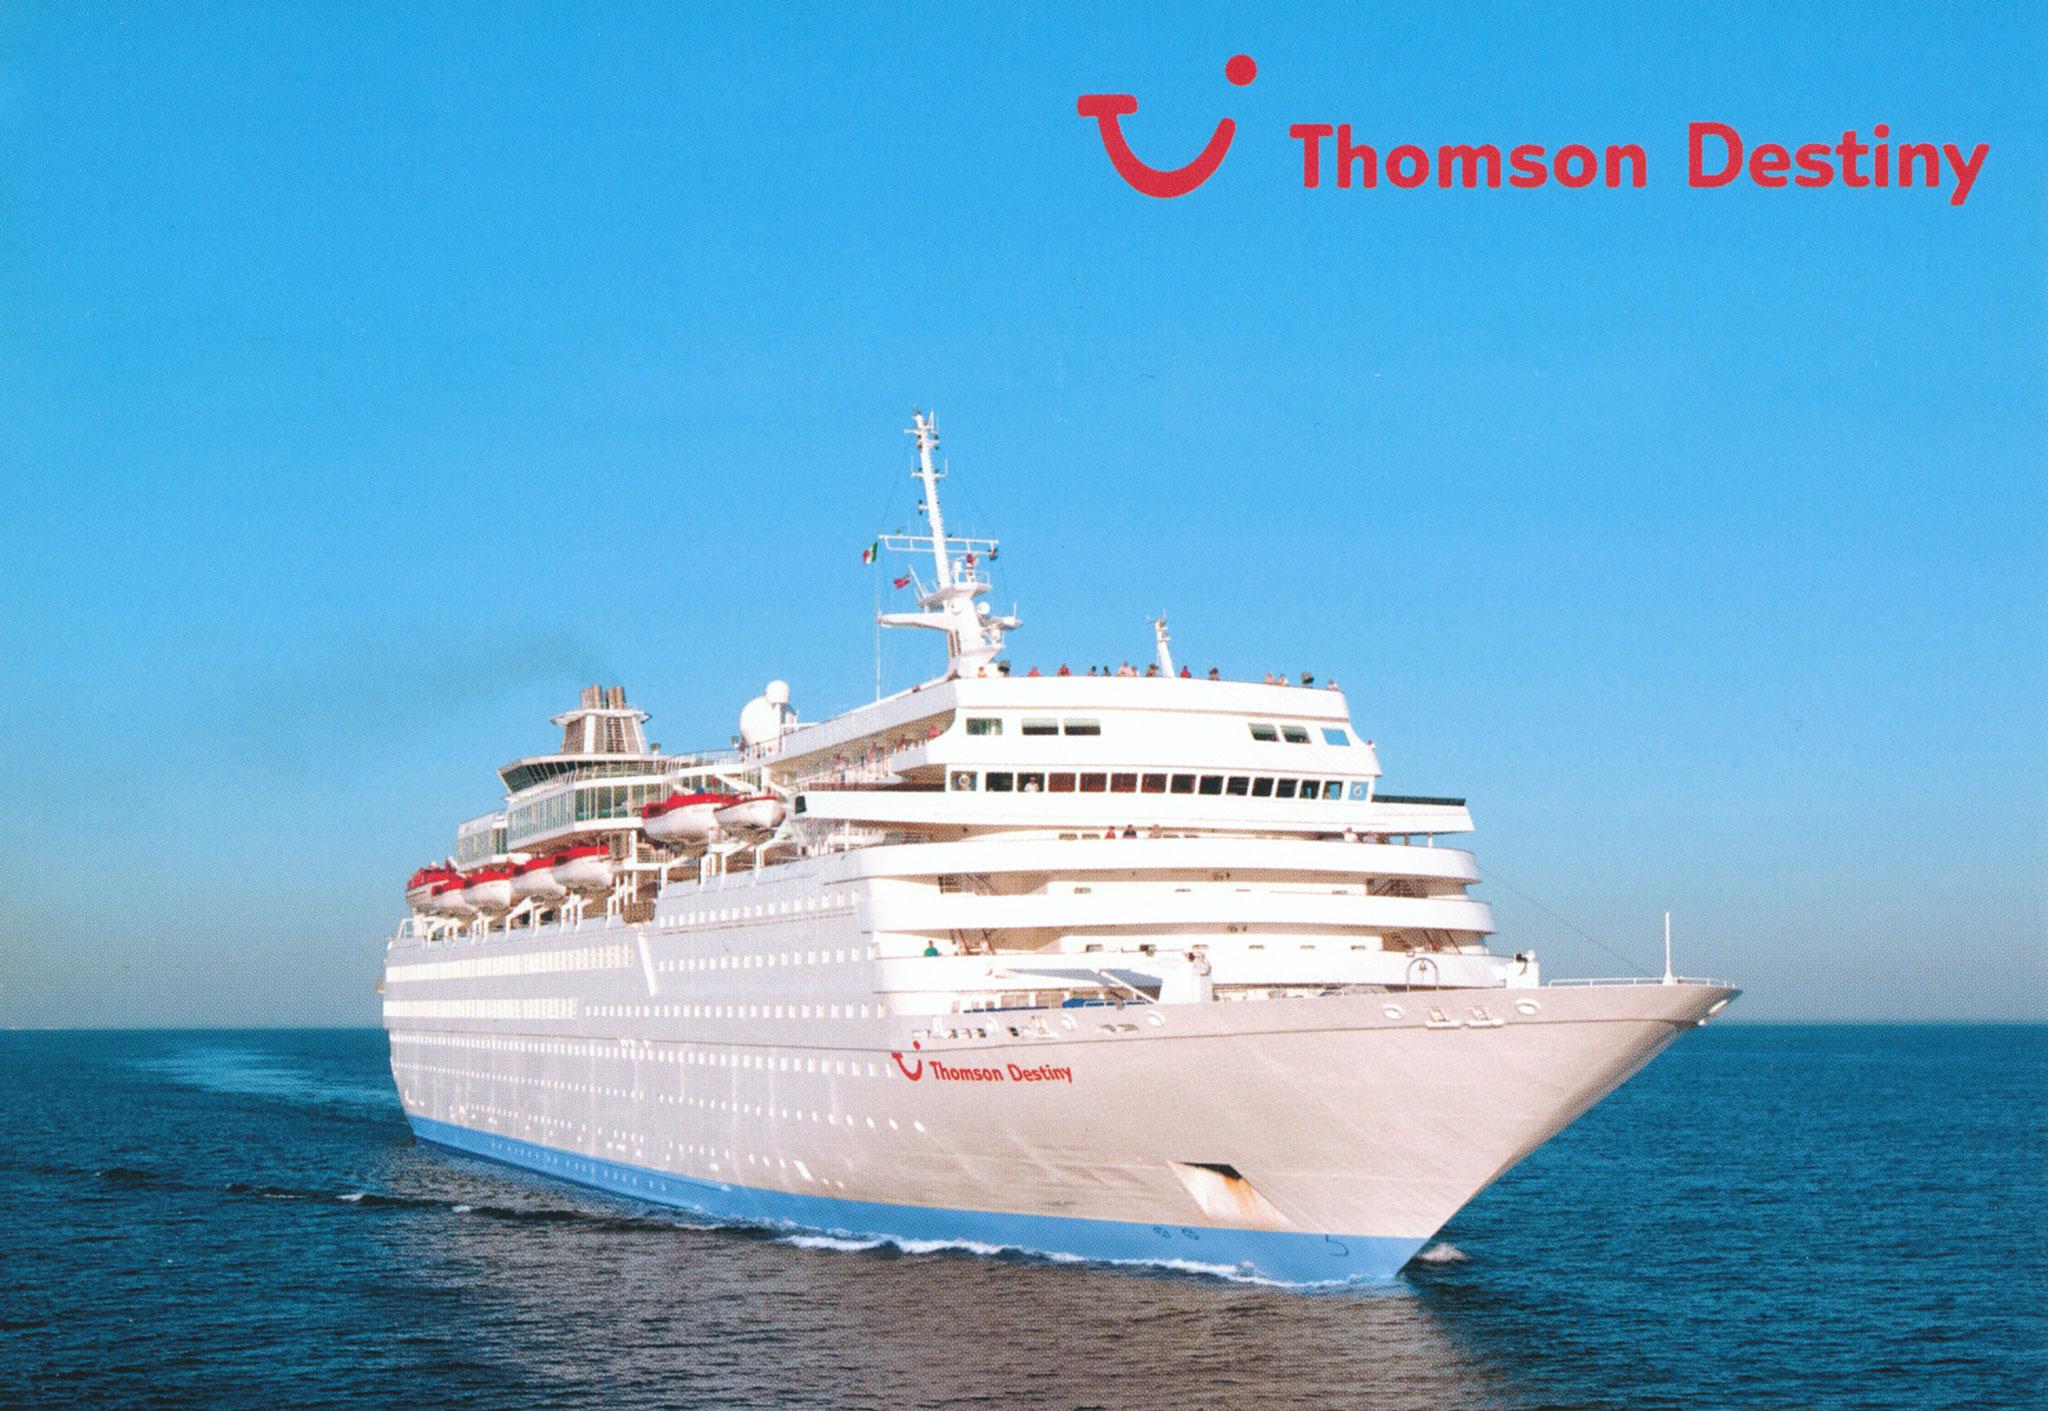 Song Of America Cruise Ship Postcards - Cruise ships uk